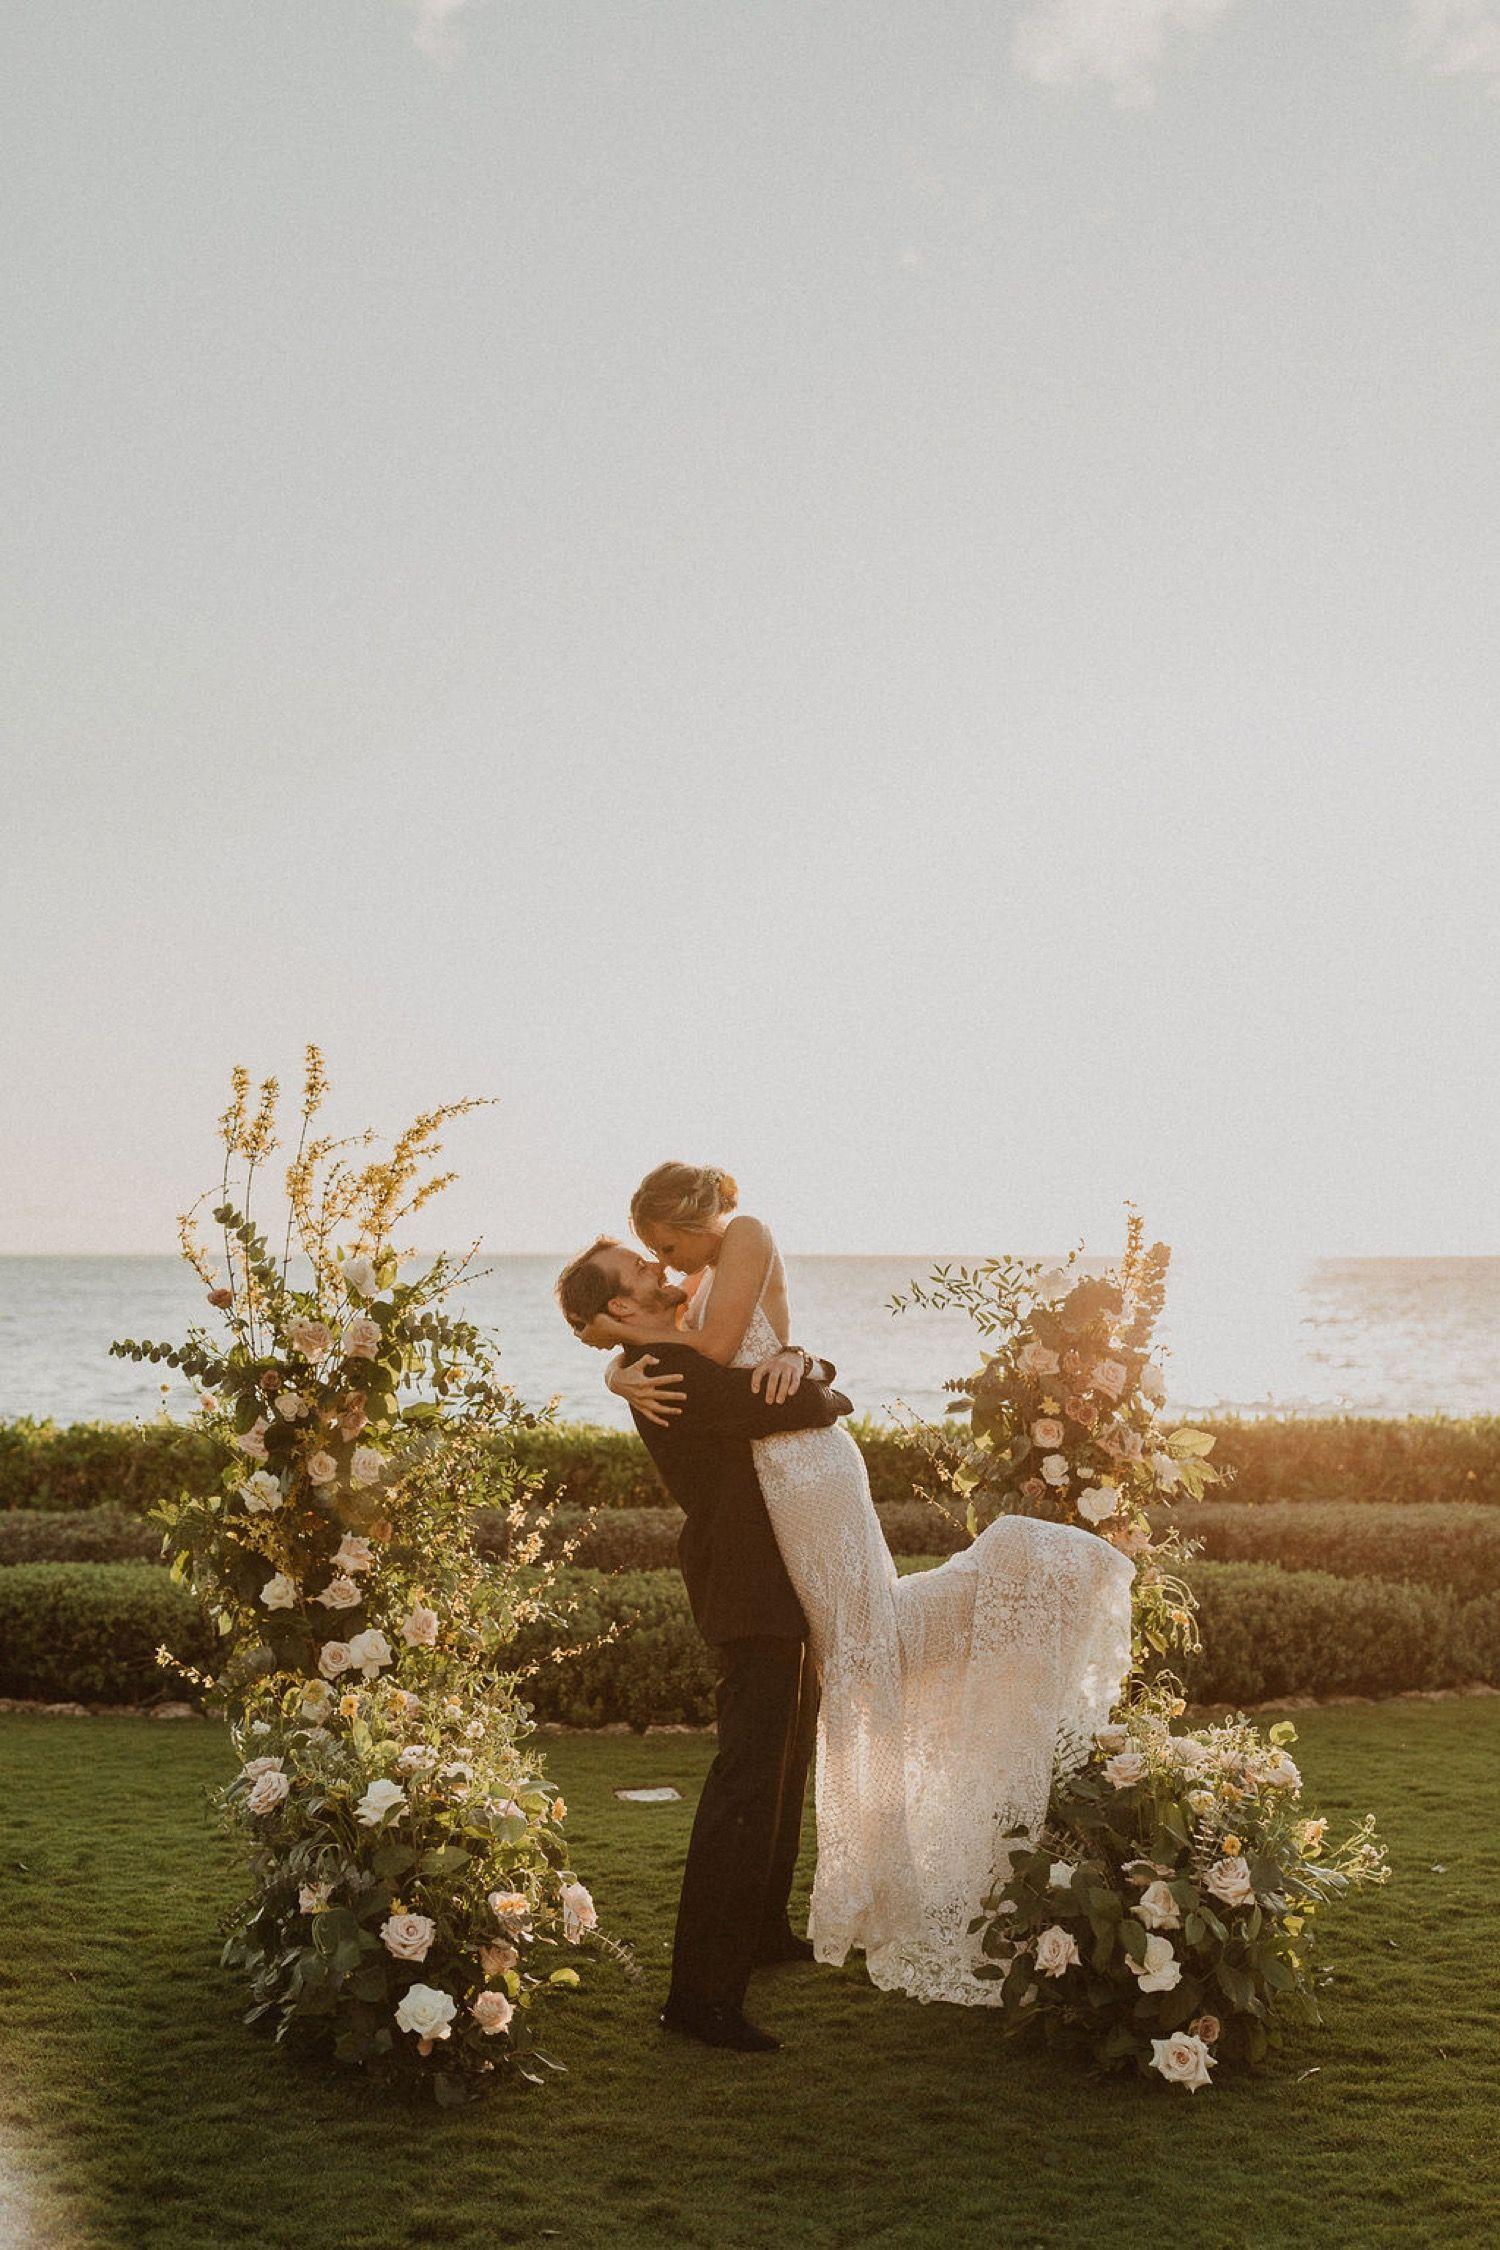 Boho Four Seasons Oahu Wedding In 2020 Oahu Wedding Hawaii Wedding Hawaii Wedding Photographer